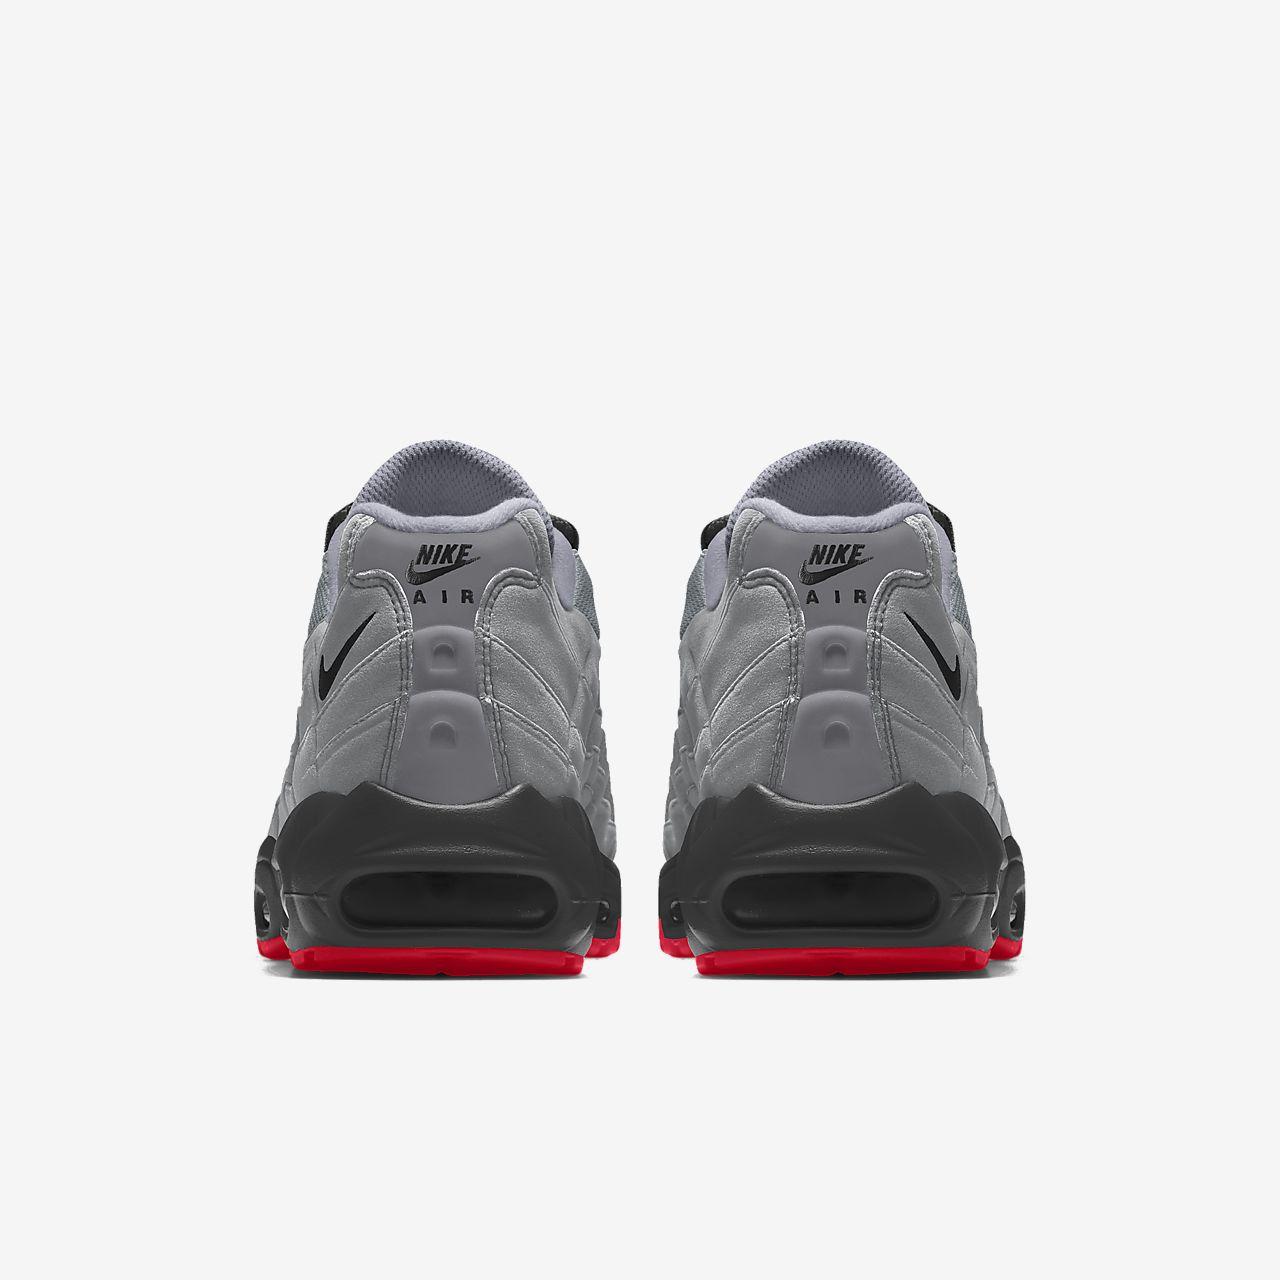 NIKE ID AIR Max 95 Triple Black Shoes 314350 997 Size Men's